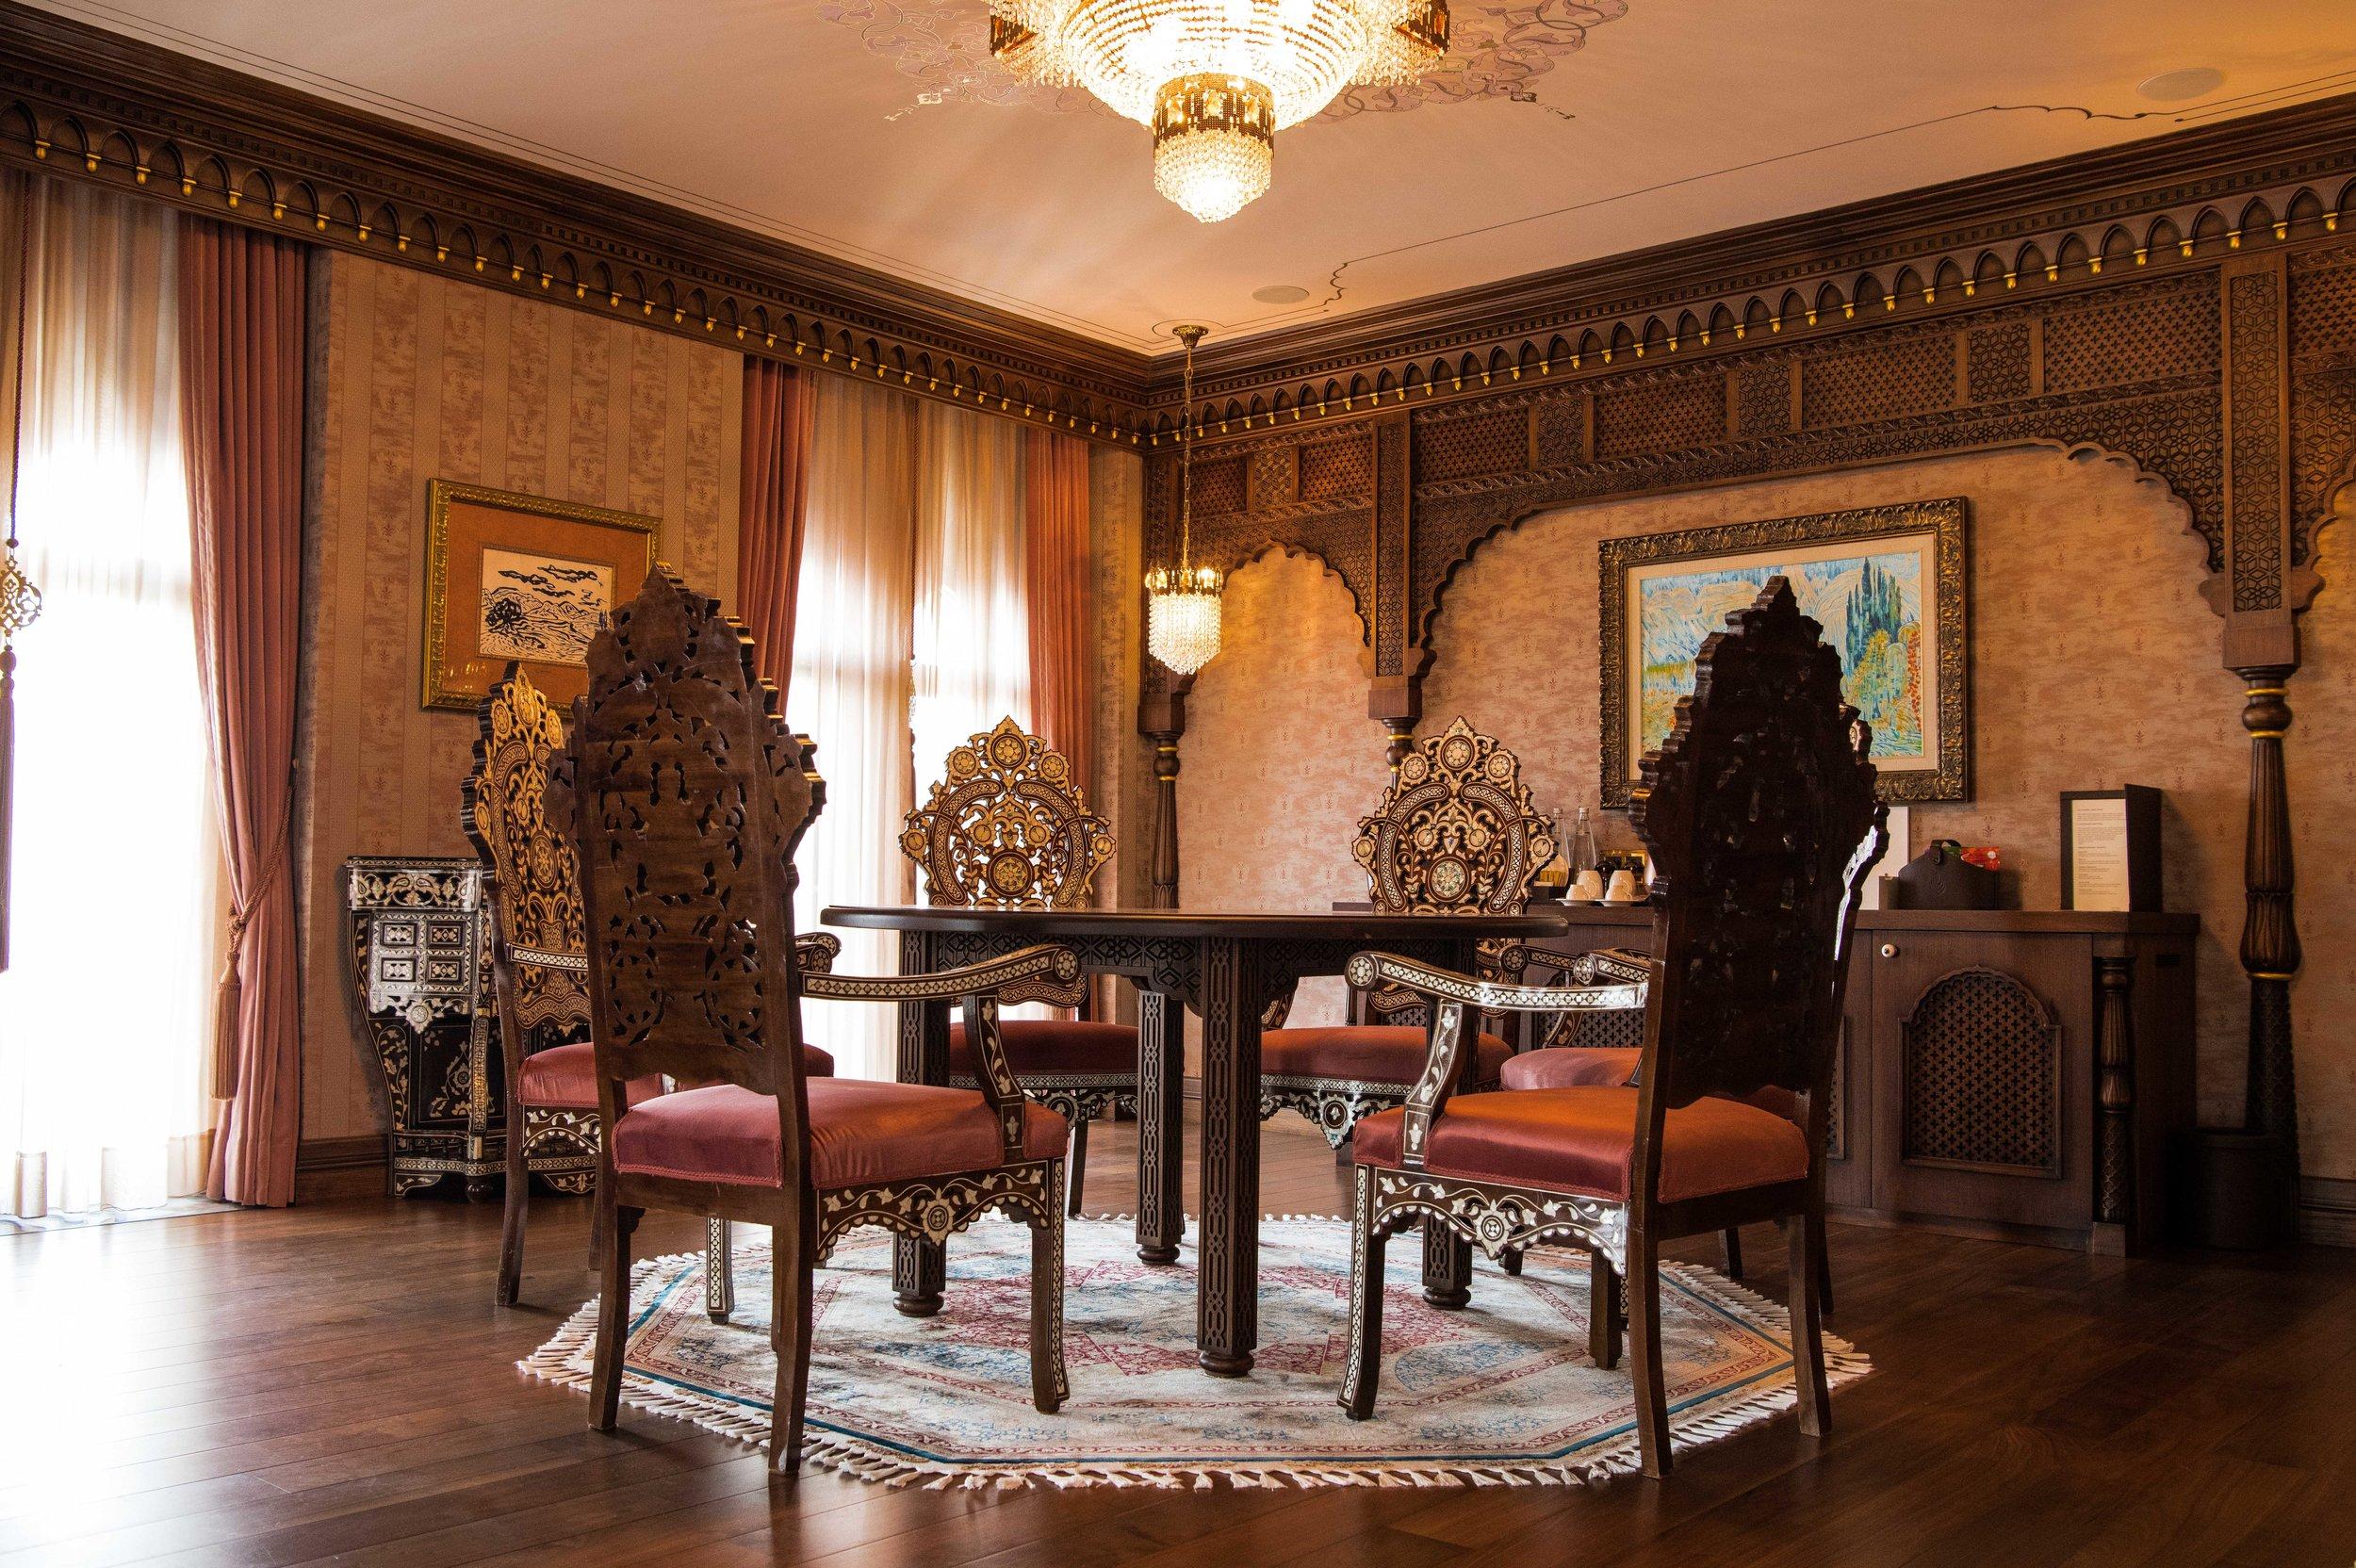 thetravelhub_istanbul_ajwa hotel-1299.jpg